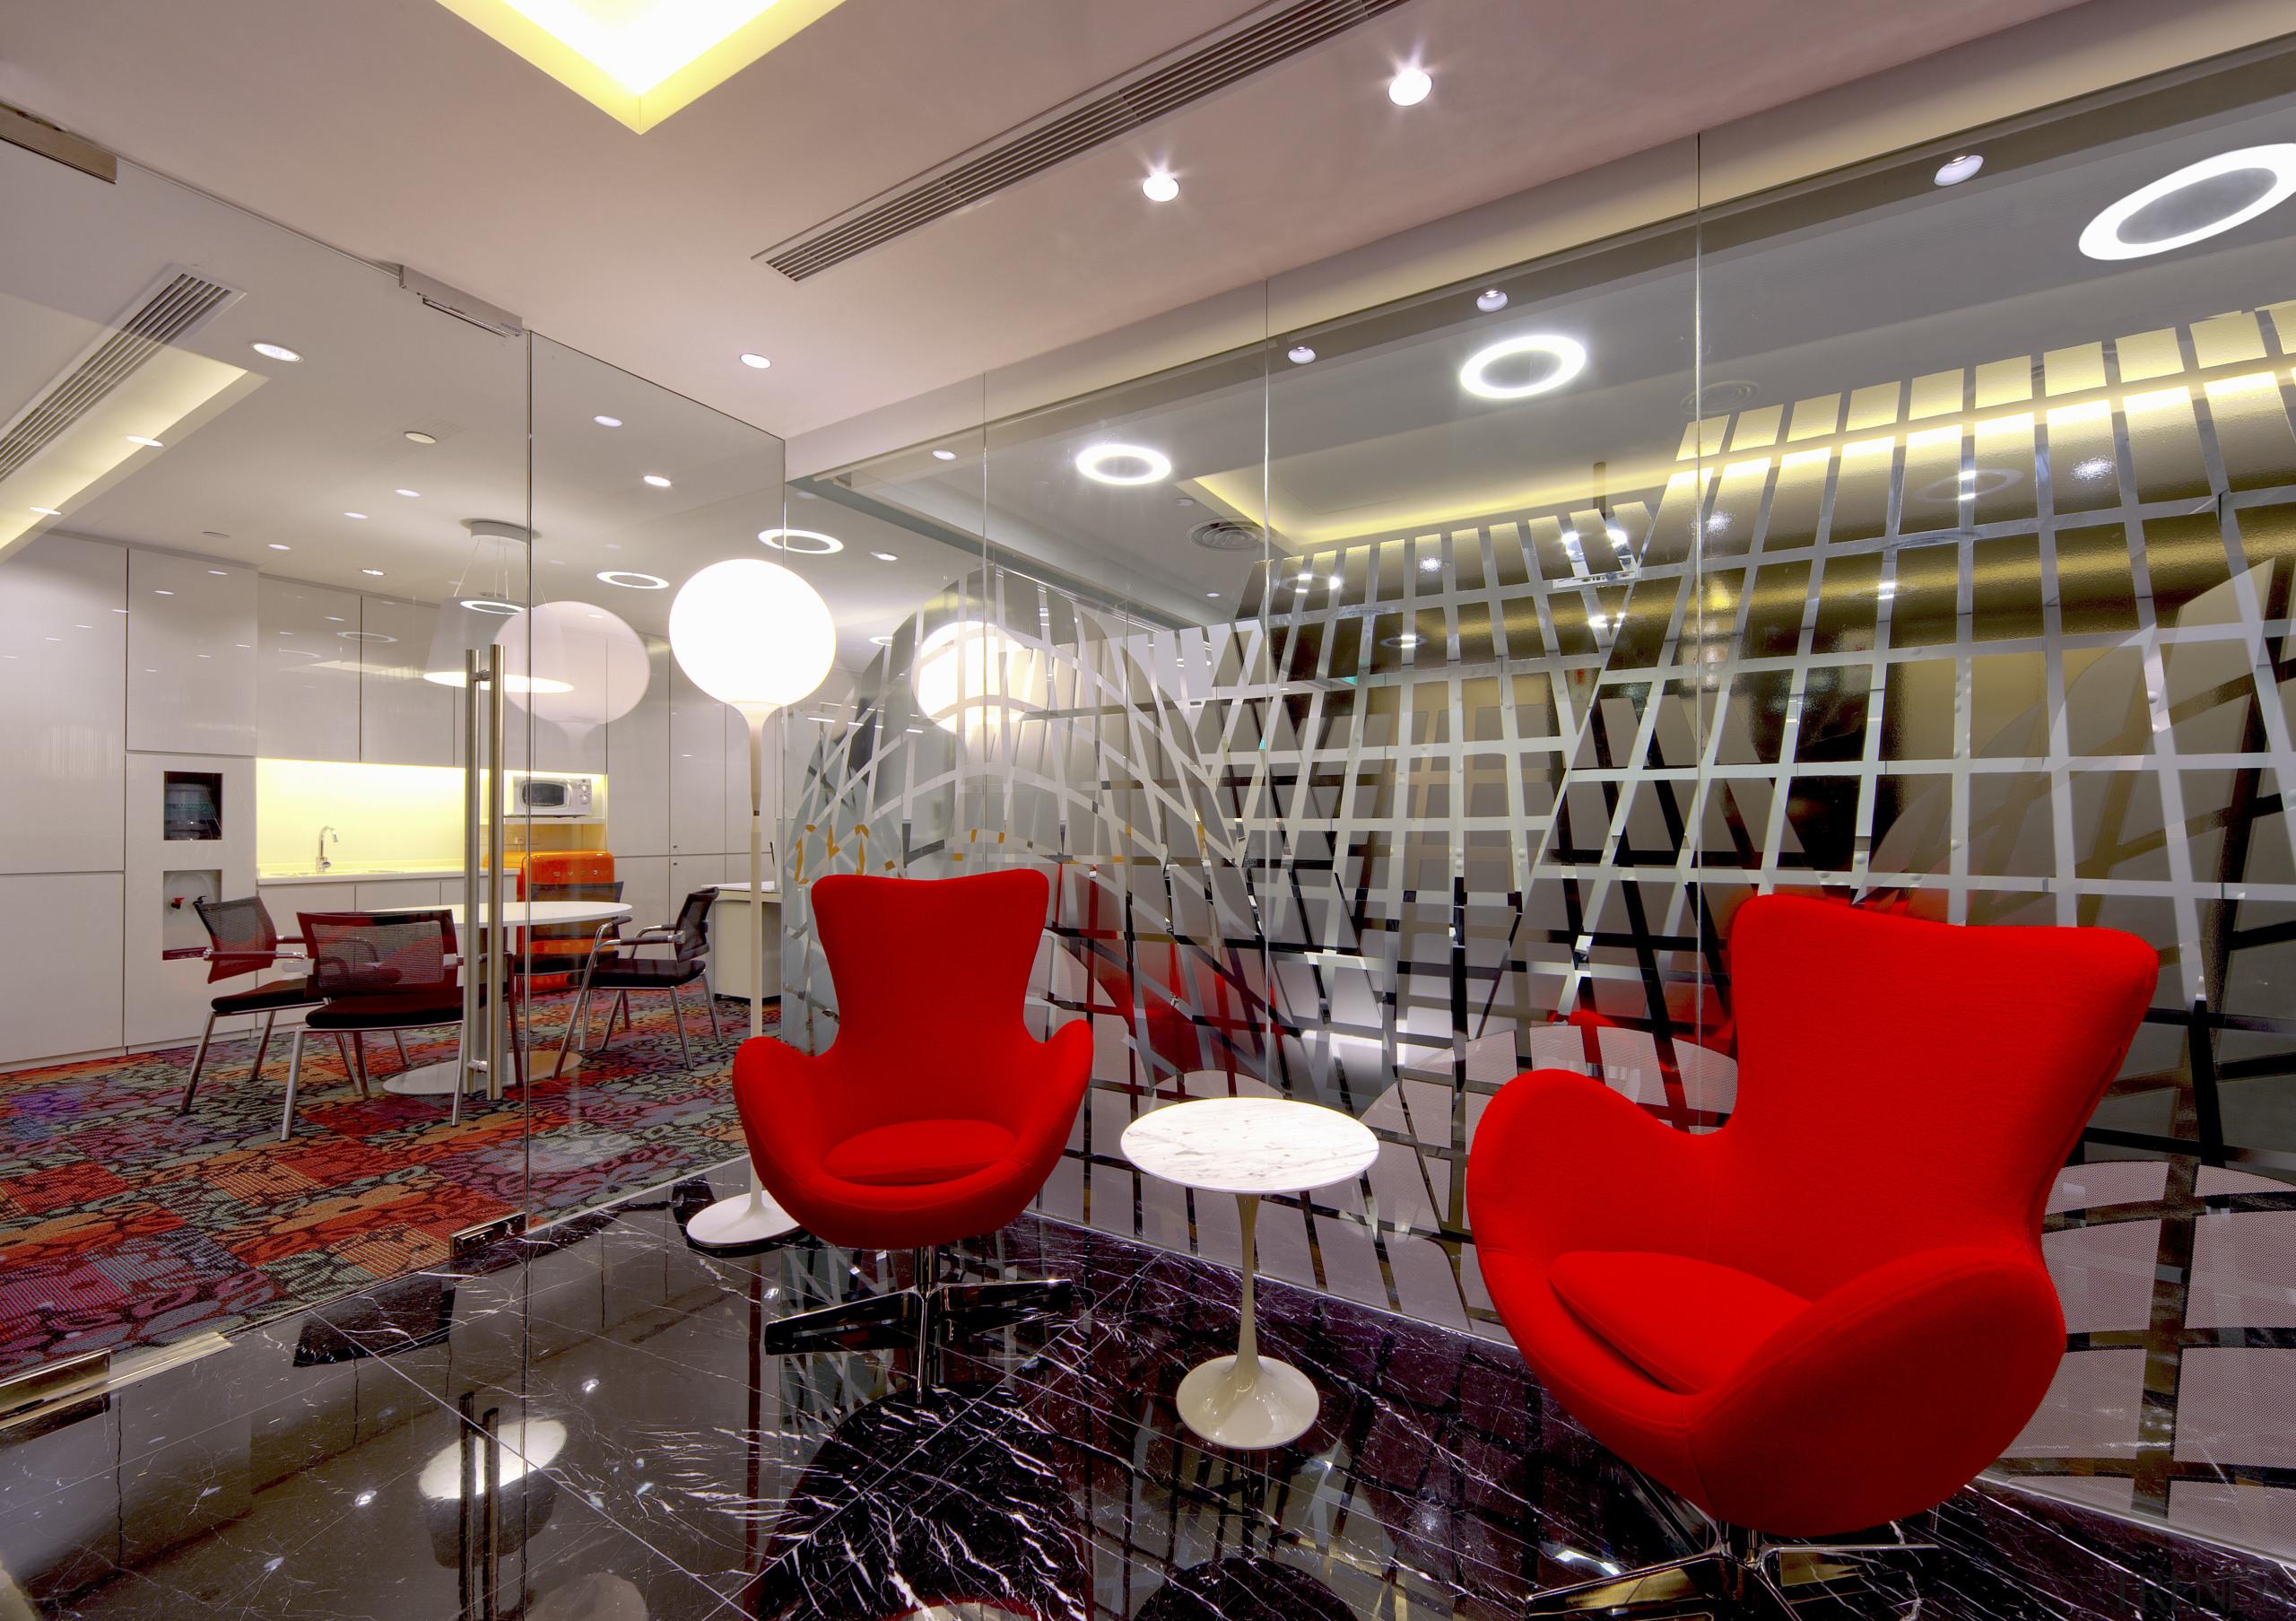 Contemporary offices of  the Real Estate Developer's café, ceiling, interior design, lobby, restaurant, gray